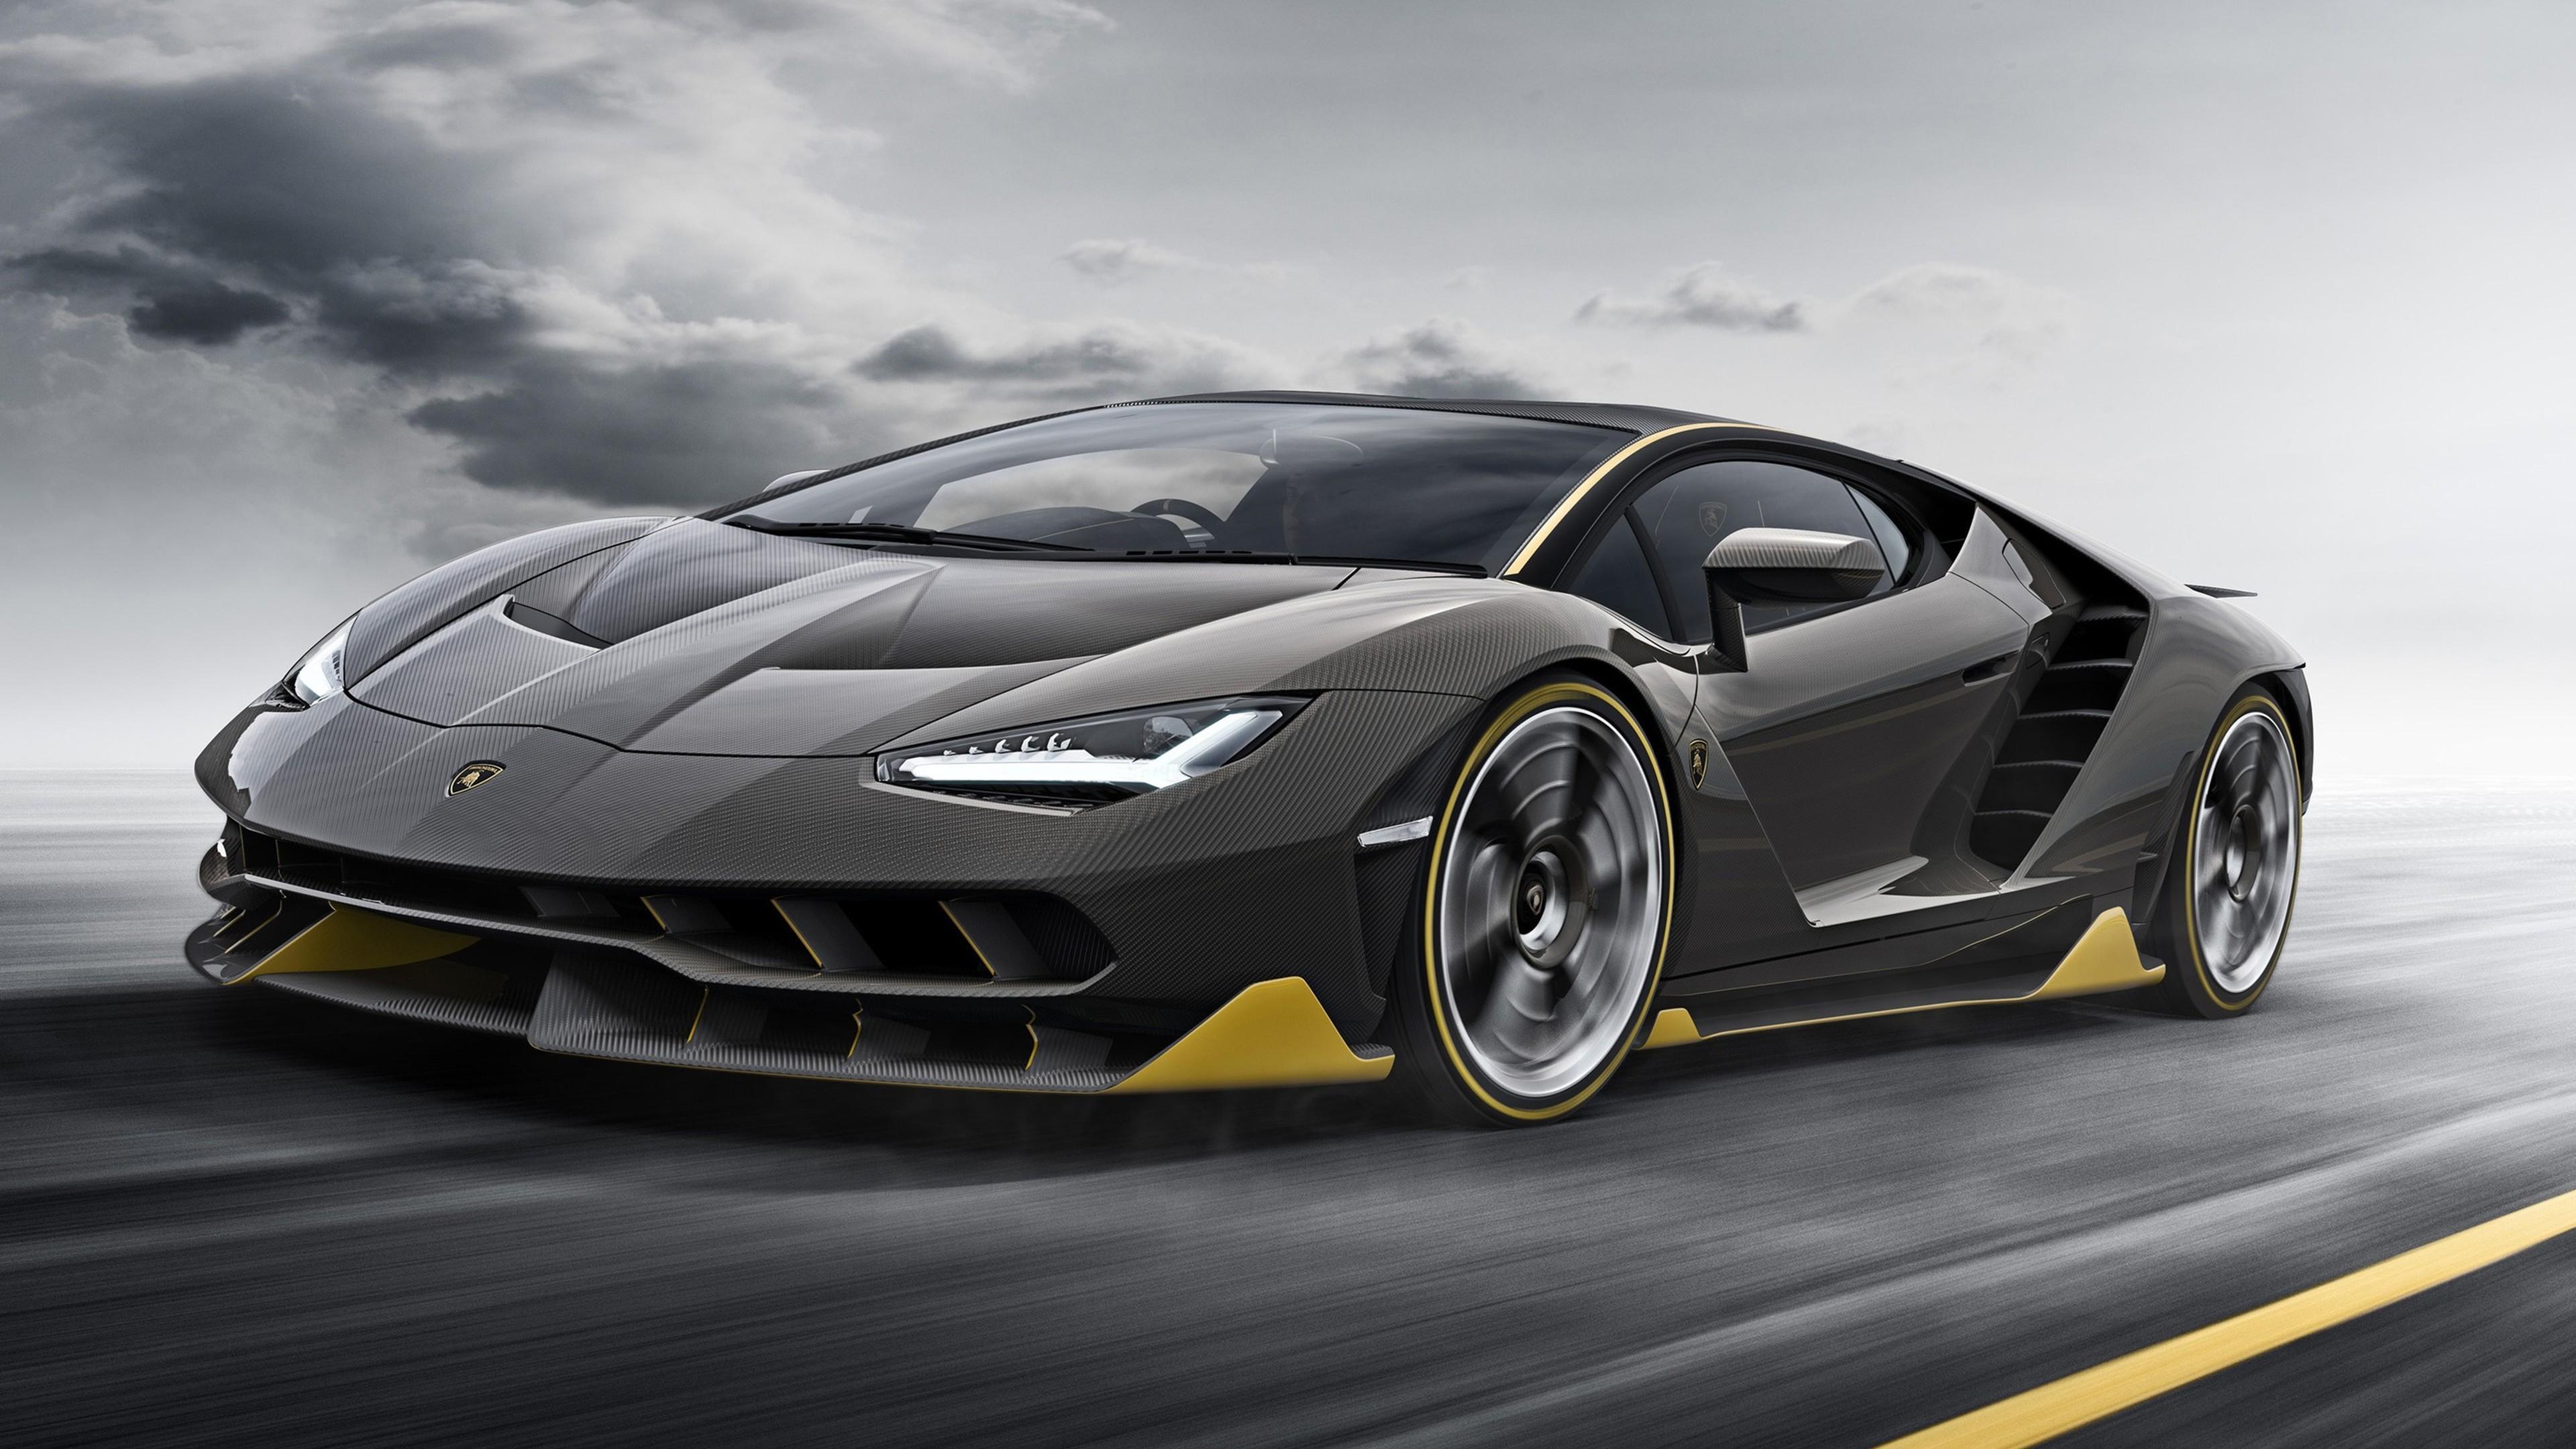 vehicle listings gallardo turbo overview dsc sale heffner for muscle twin convertible real lamborghini